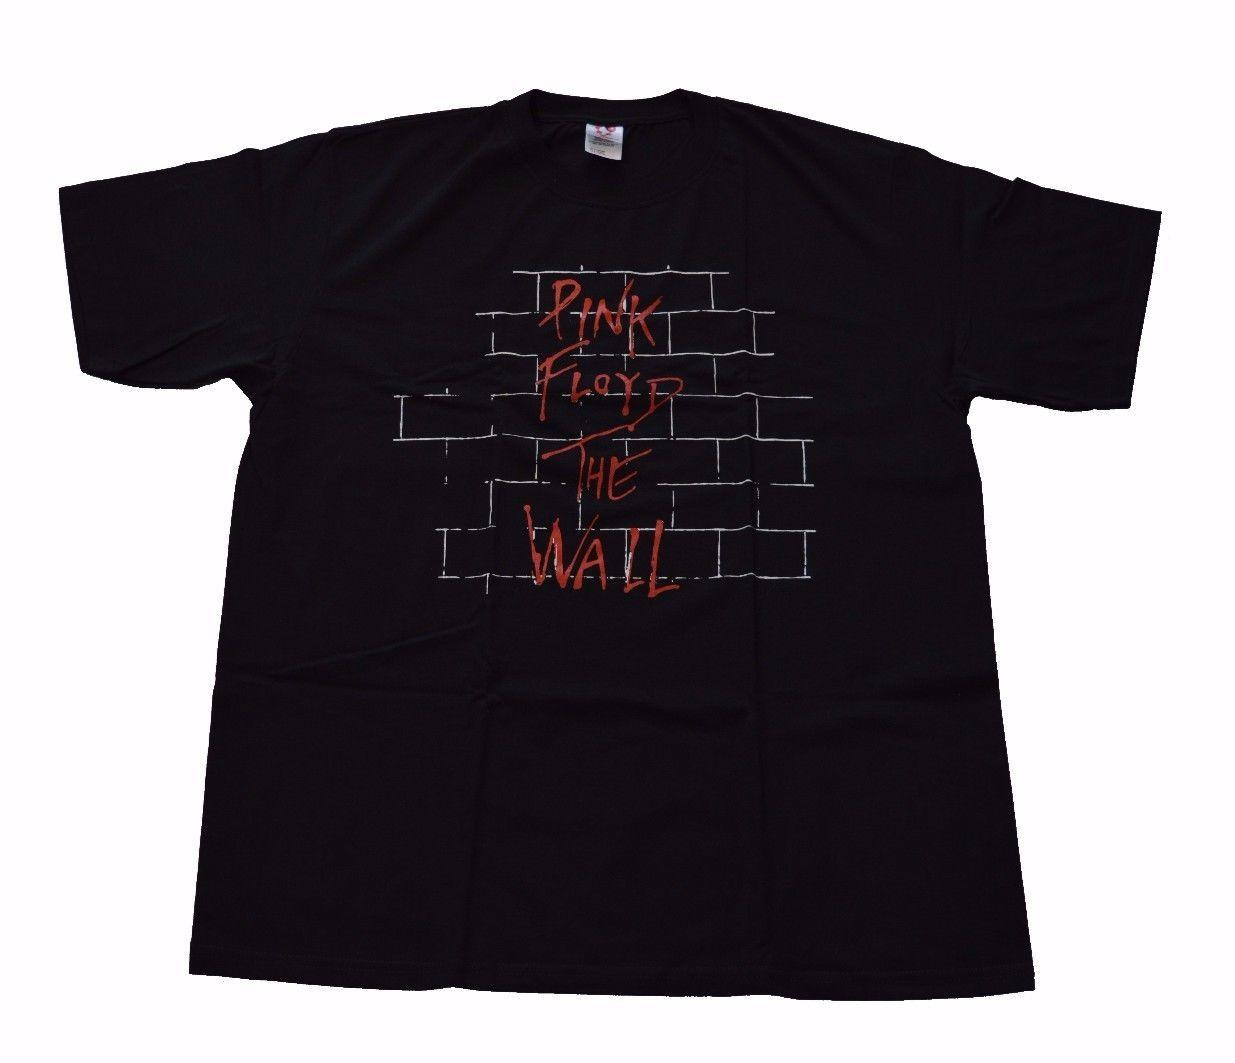 Image of Pink Floyd The Wall Tshirt XL